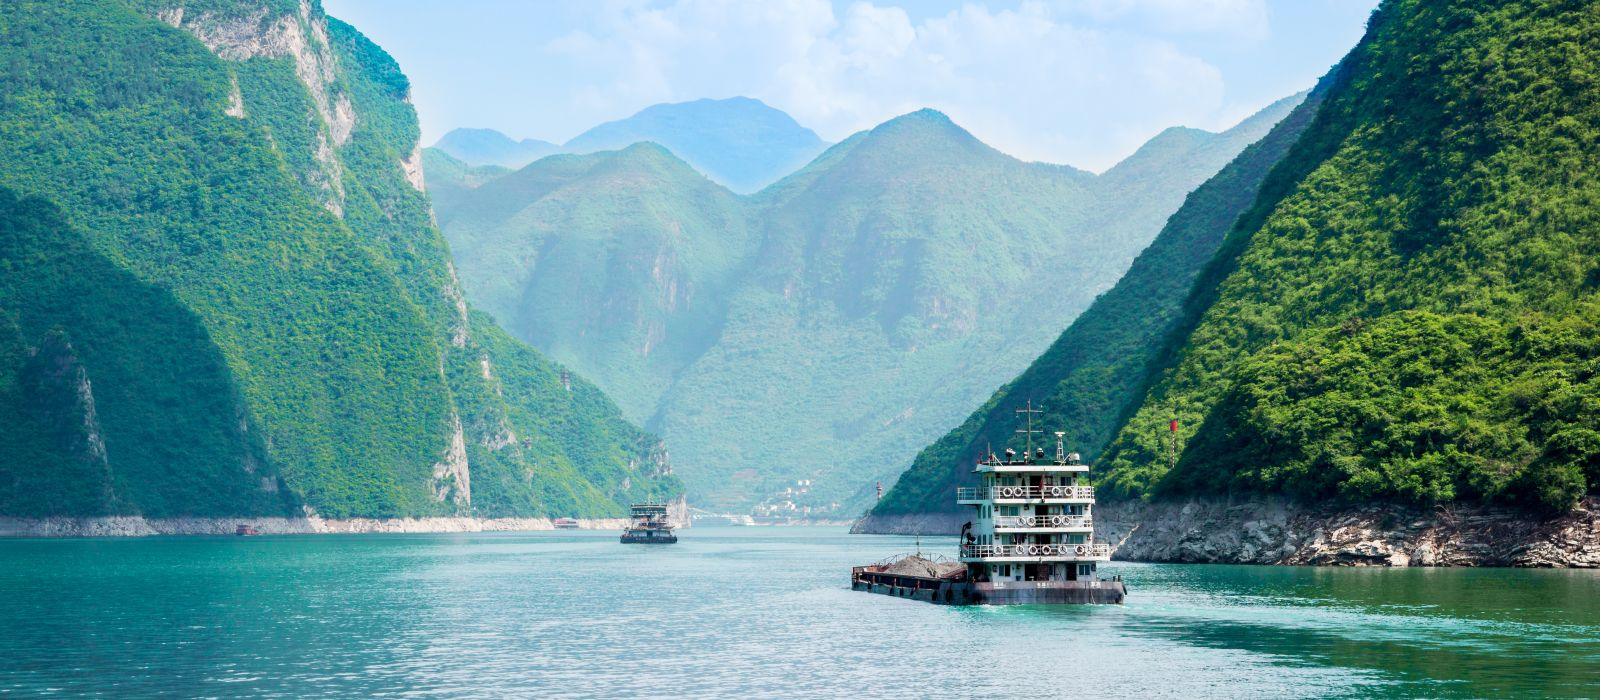 Destination Yangtze River Cruise China